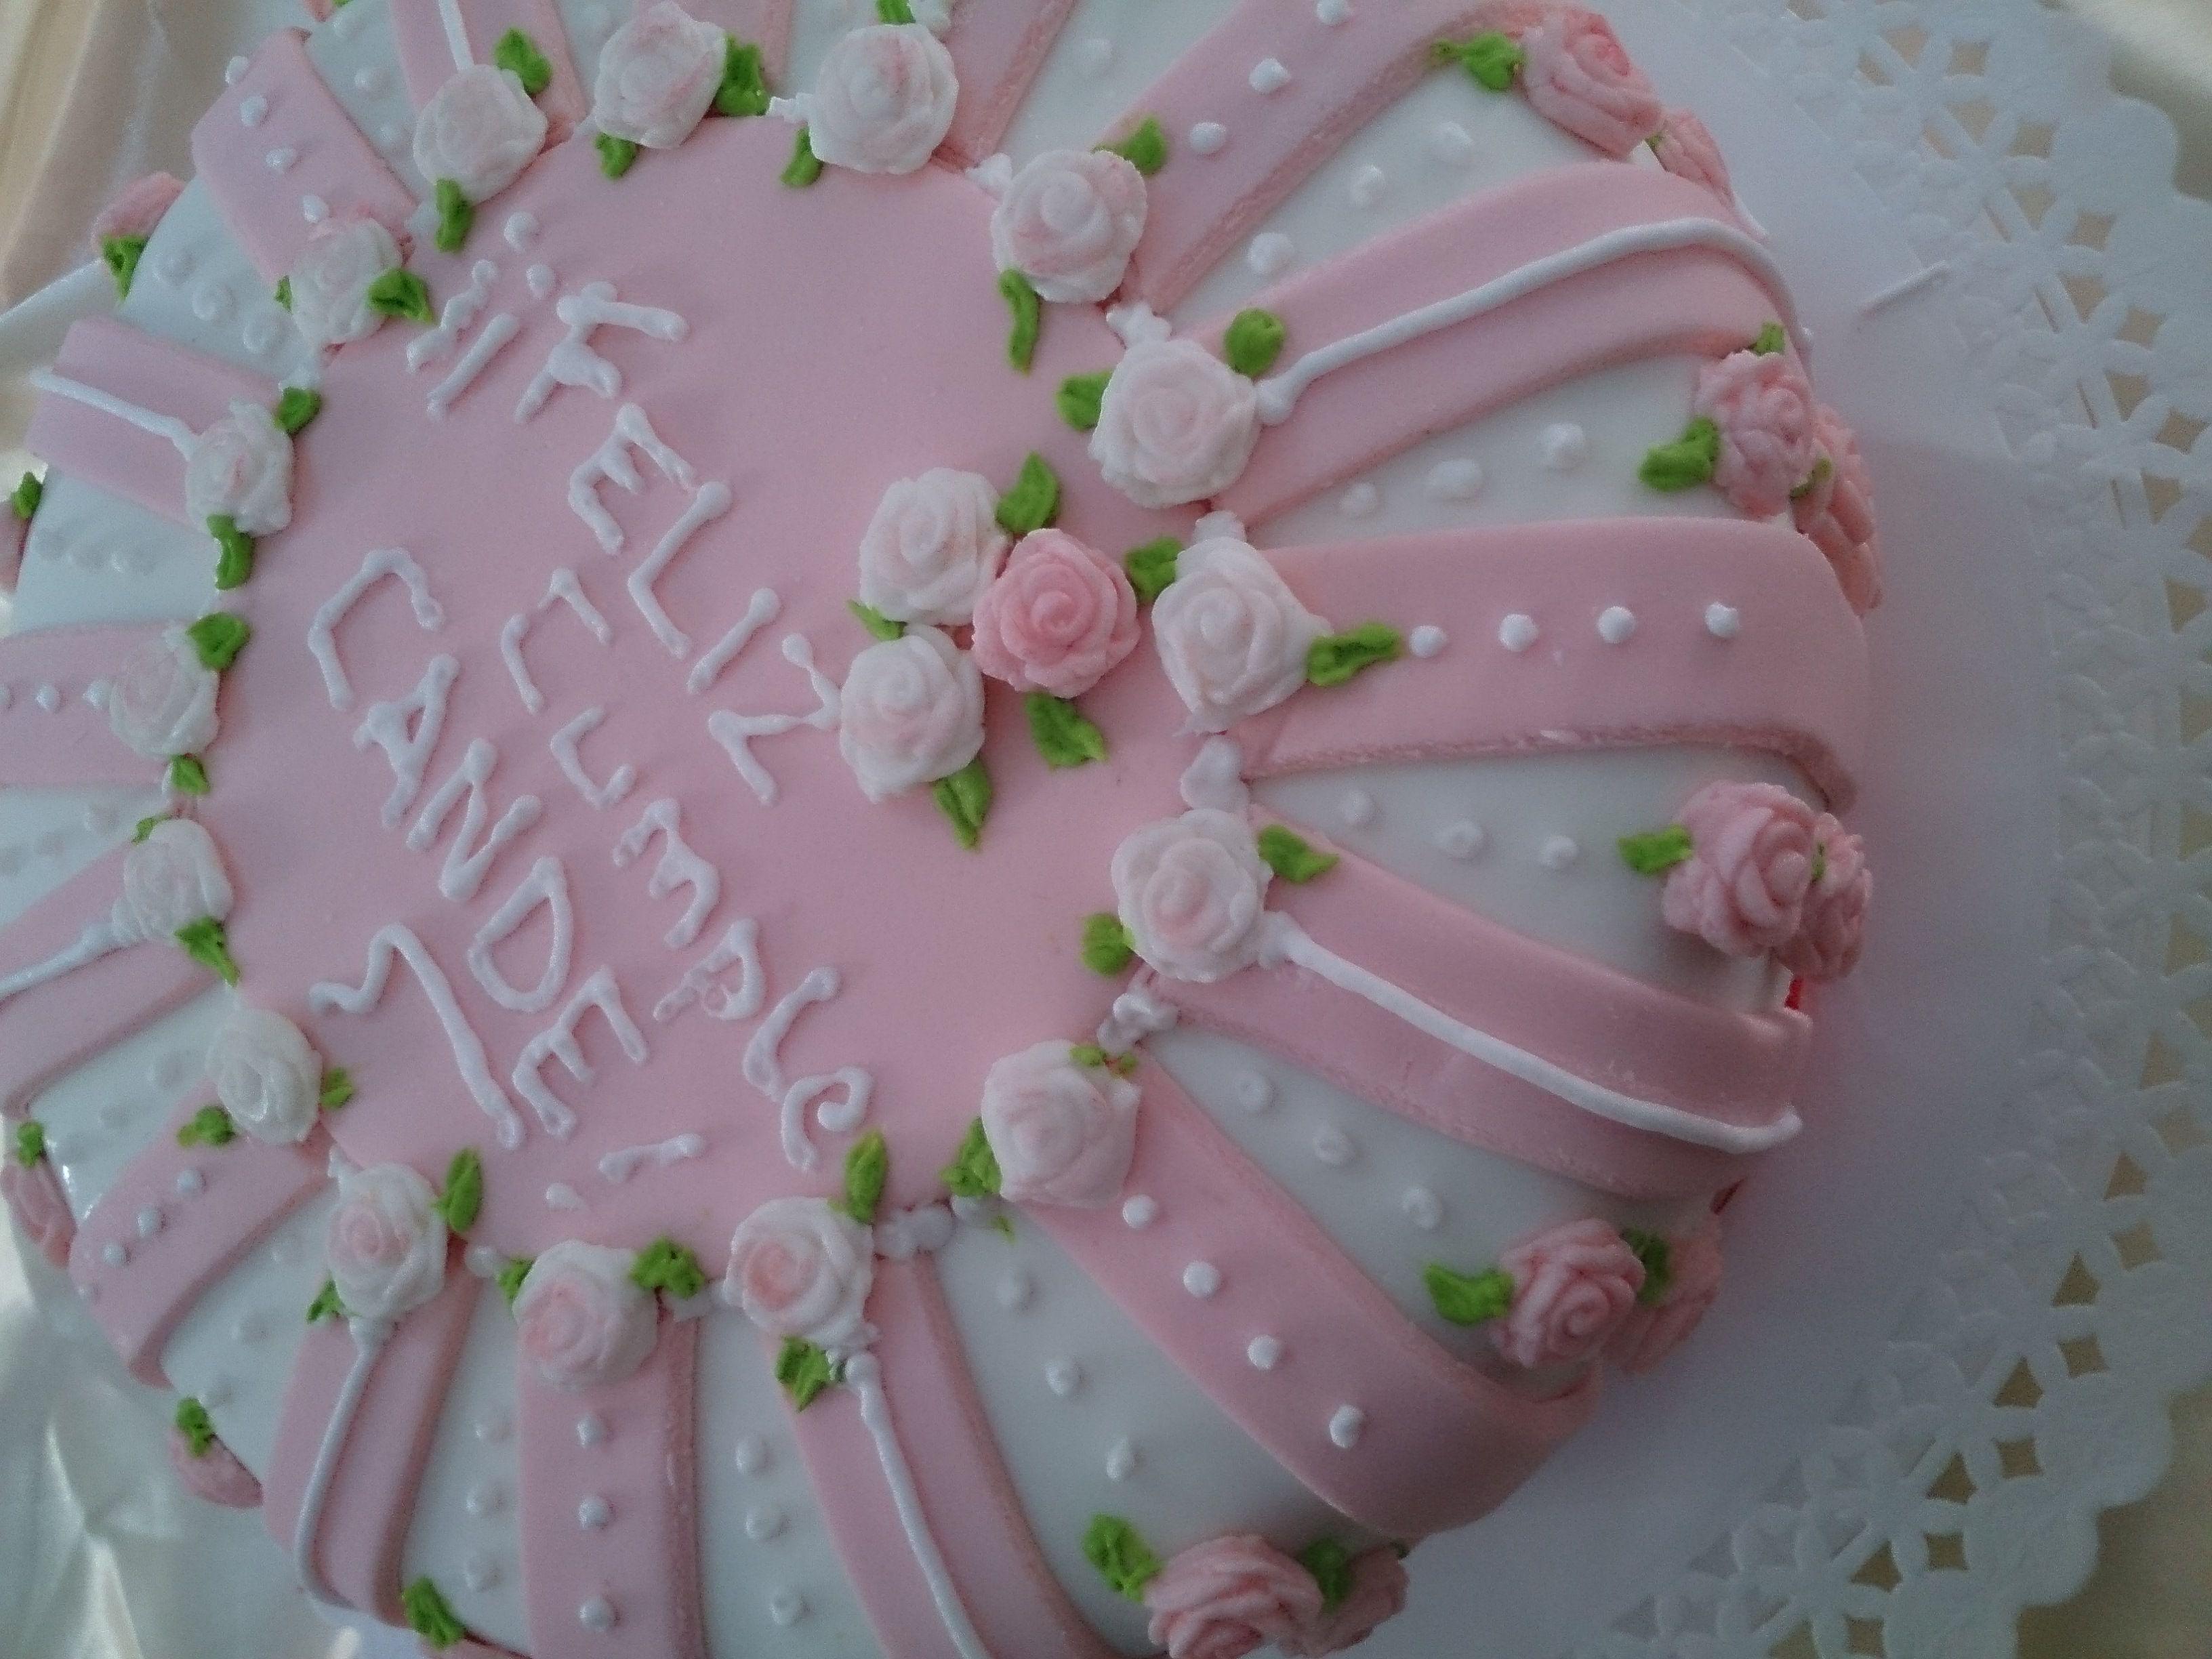 Estilo Shabby Chic Decoracion Fiestas ~   estilo Shabby Chic #tortas #torta #cumplea?os #eventos #cordoba #